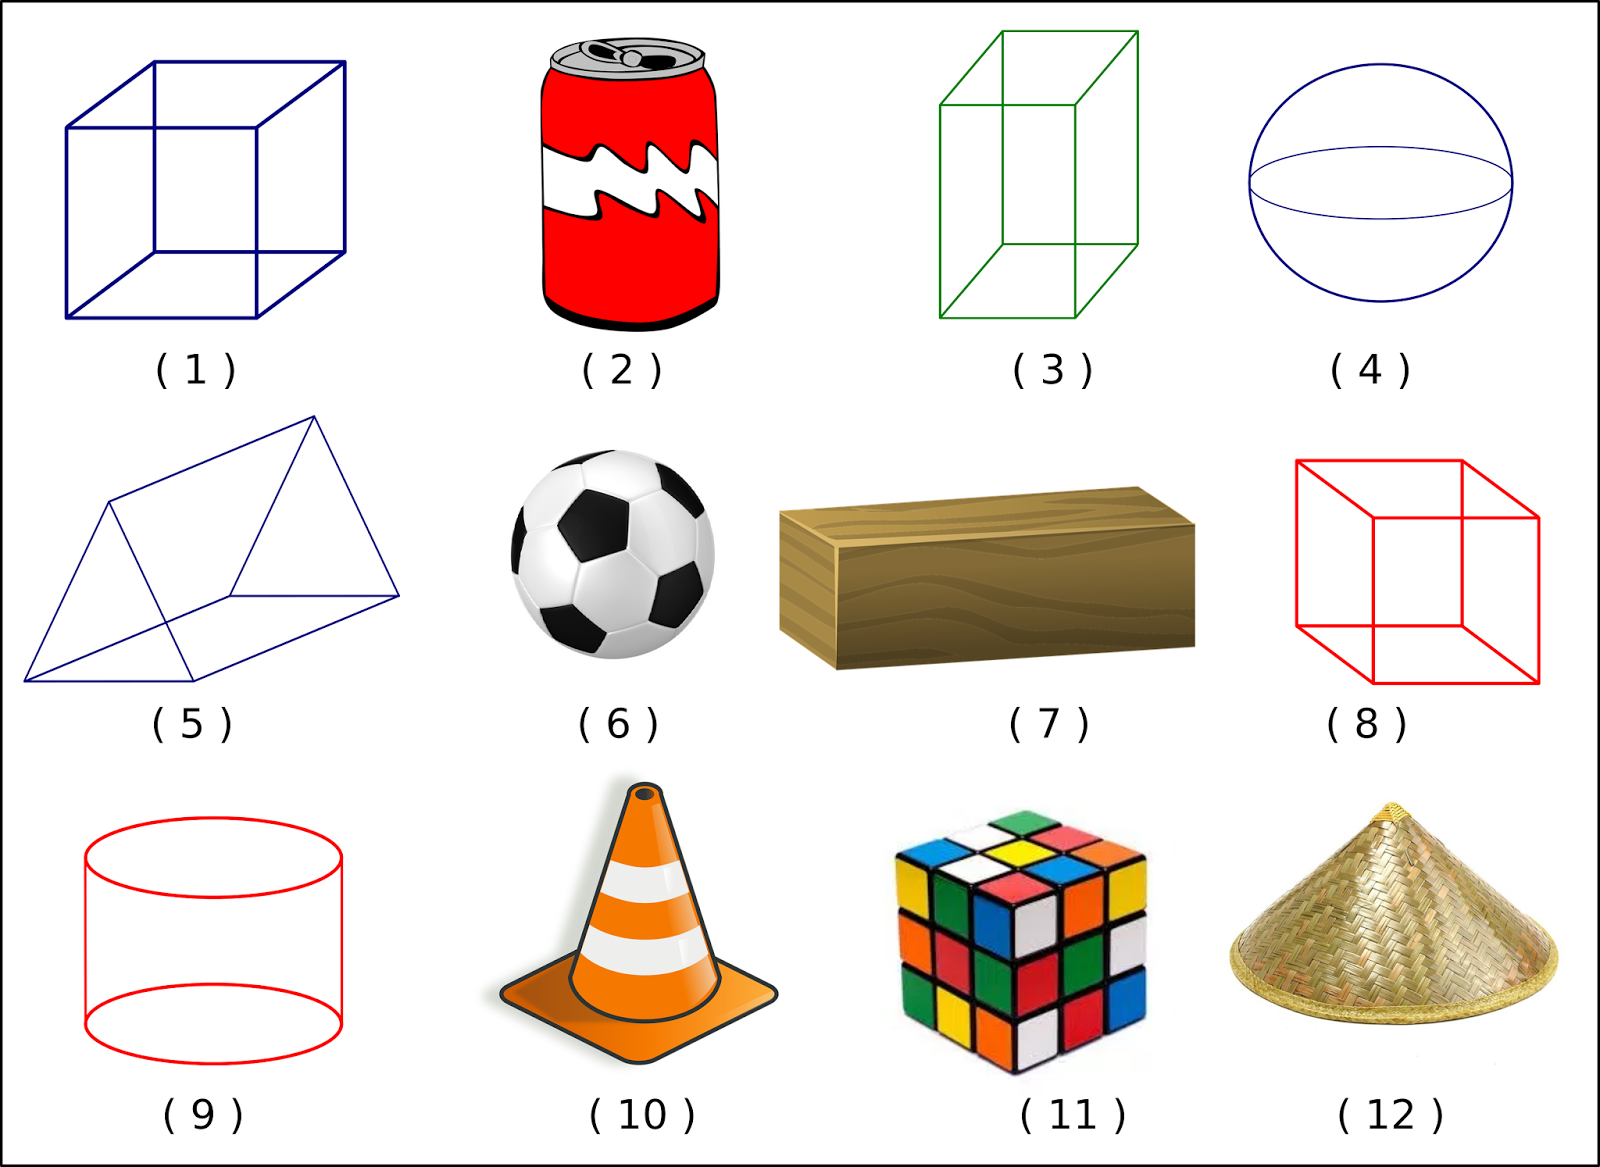 Kumpulan Soal Un Matematika Untuk Sma Download Soal Un Matematika Sma Prog Ips Kumpulan Soal